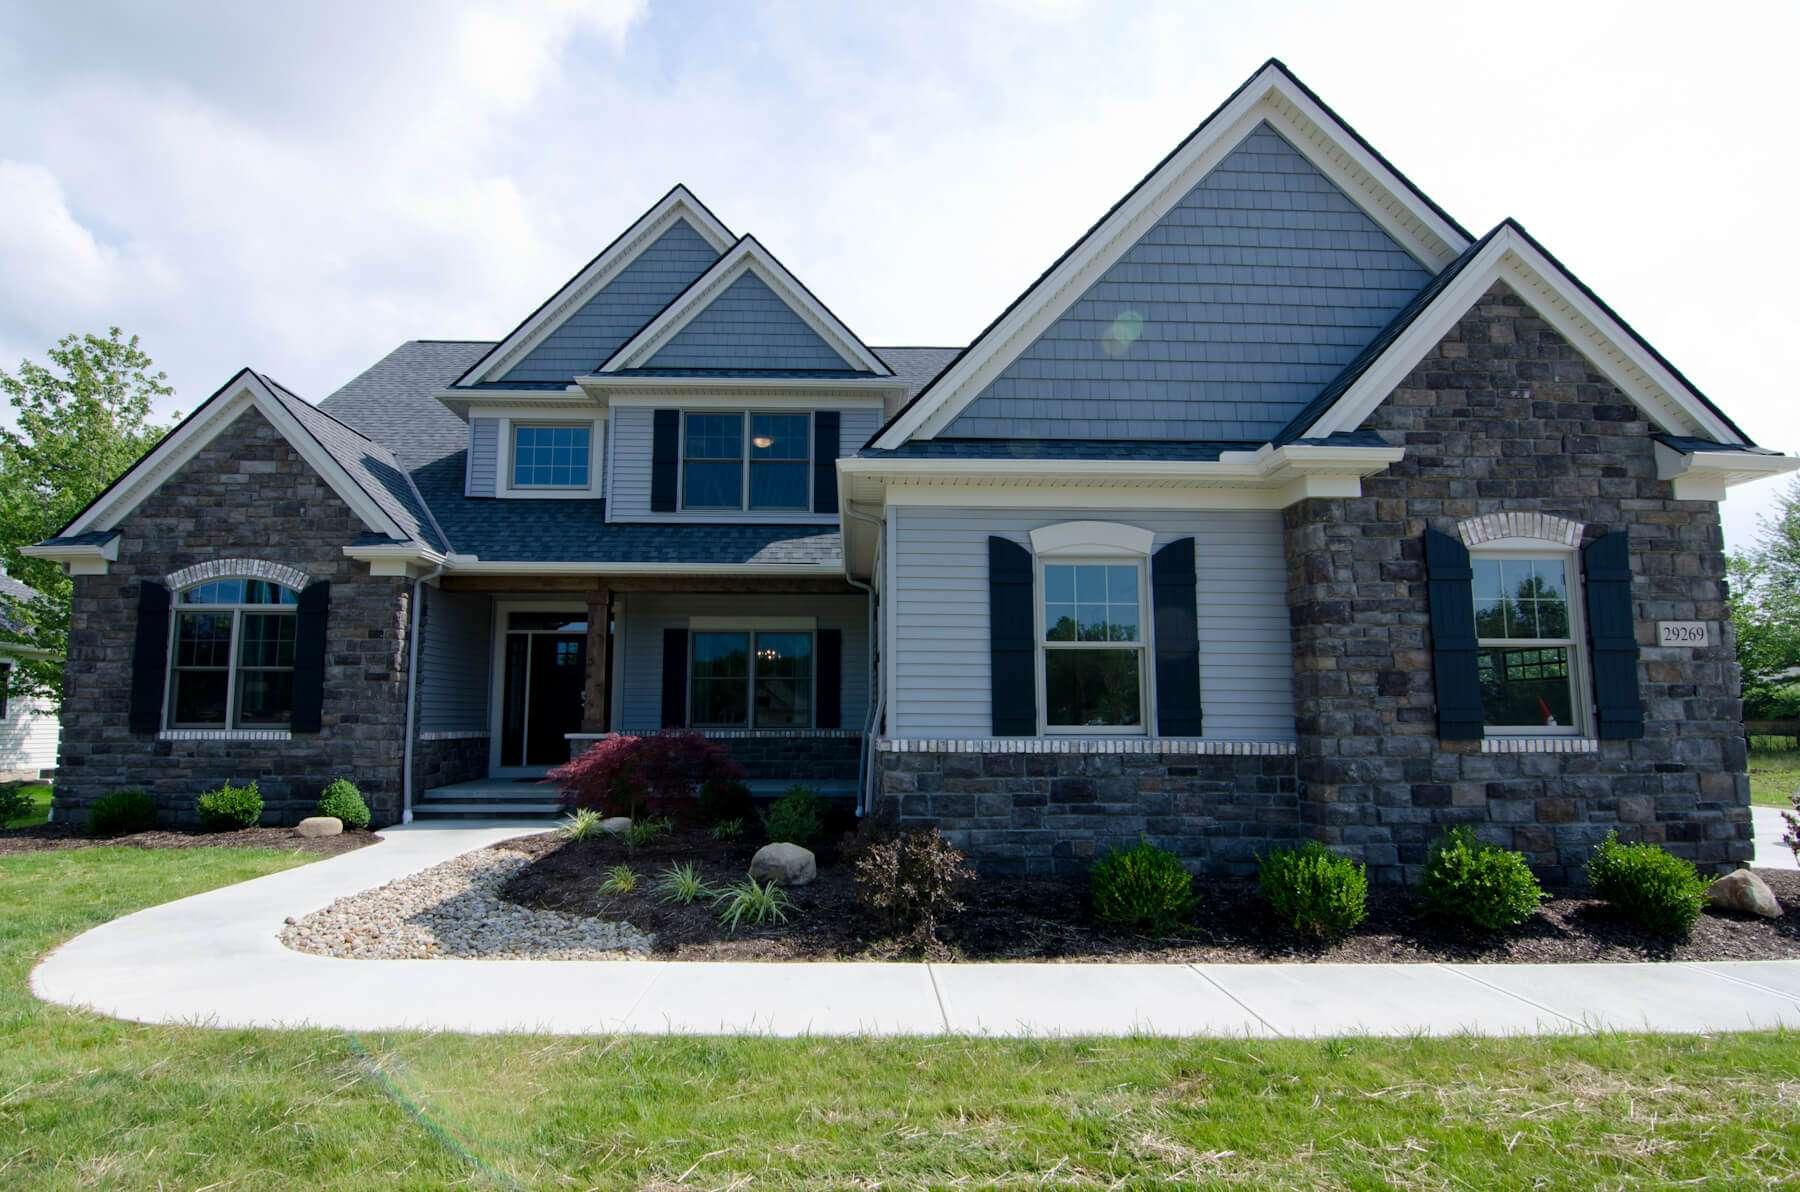 StoneCreek-Village-Westlake-Ohio-Stone-Creek-Village-SL-3-29269-Gray-Stone-Dr-Westlake-OH-MODEL-HOME-2